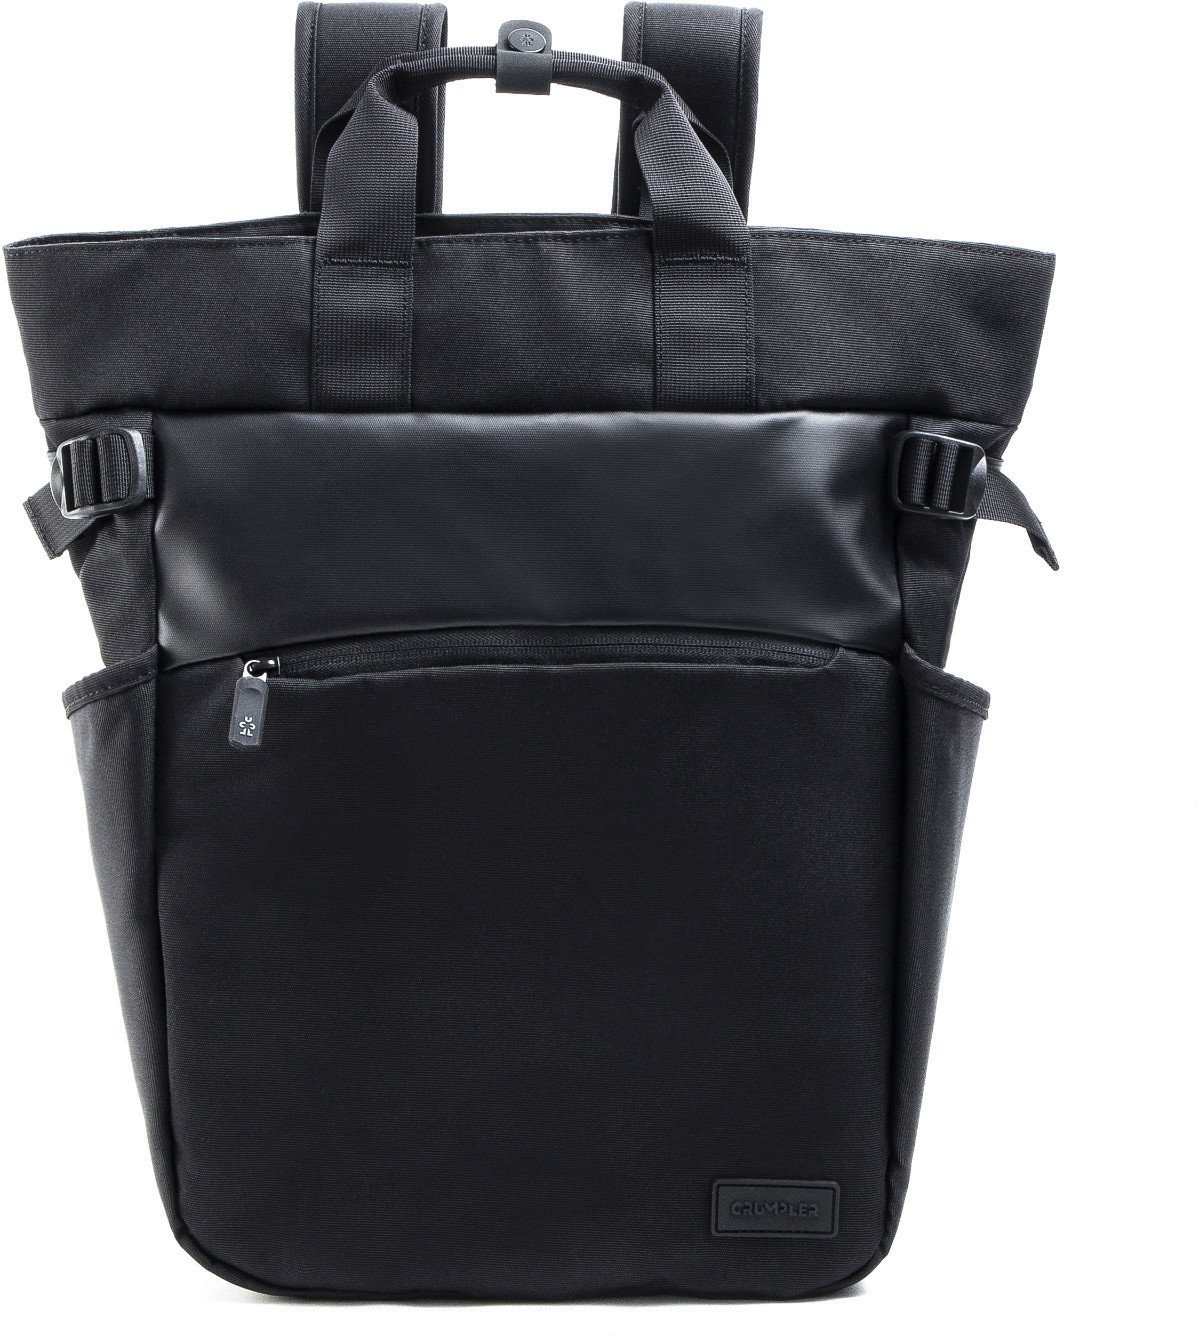 Image of Crumpler Art Collective Creators Backpack